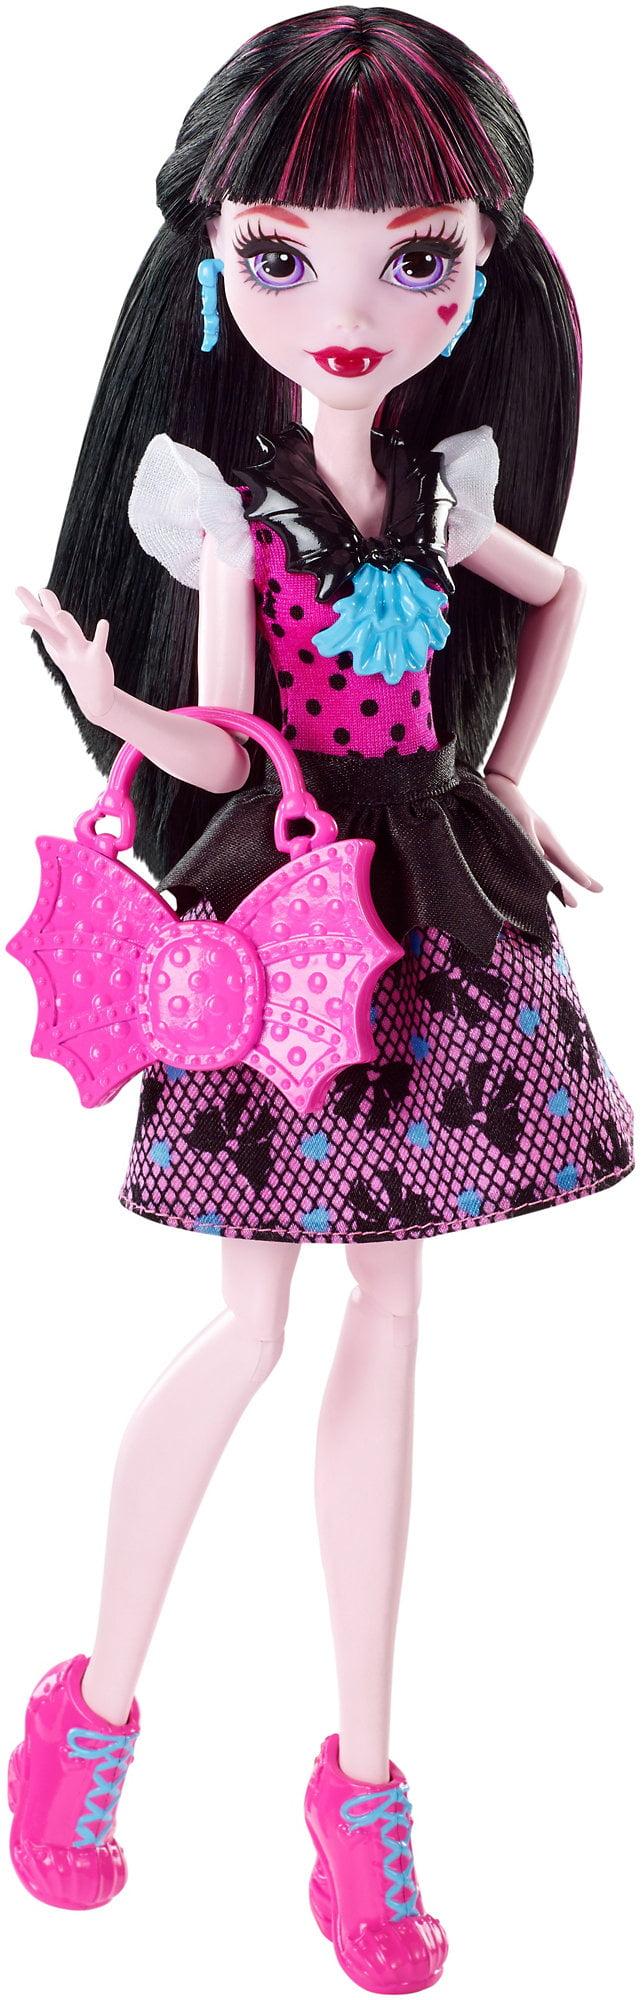 Monster High Draculaura Doll by MATTEL INC.